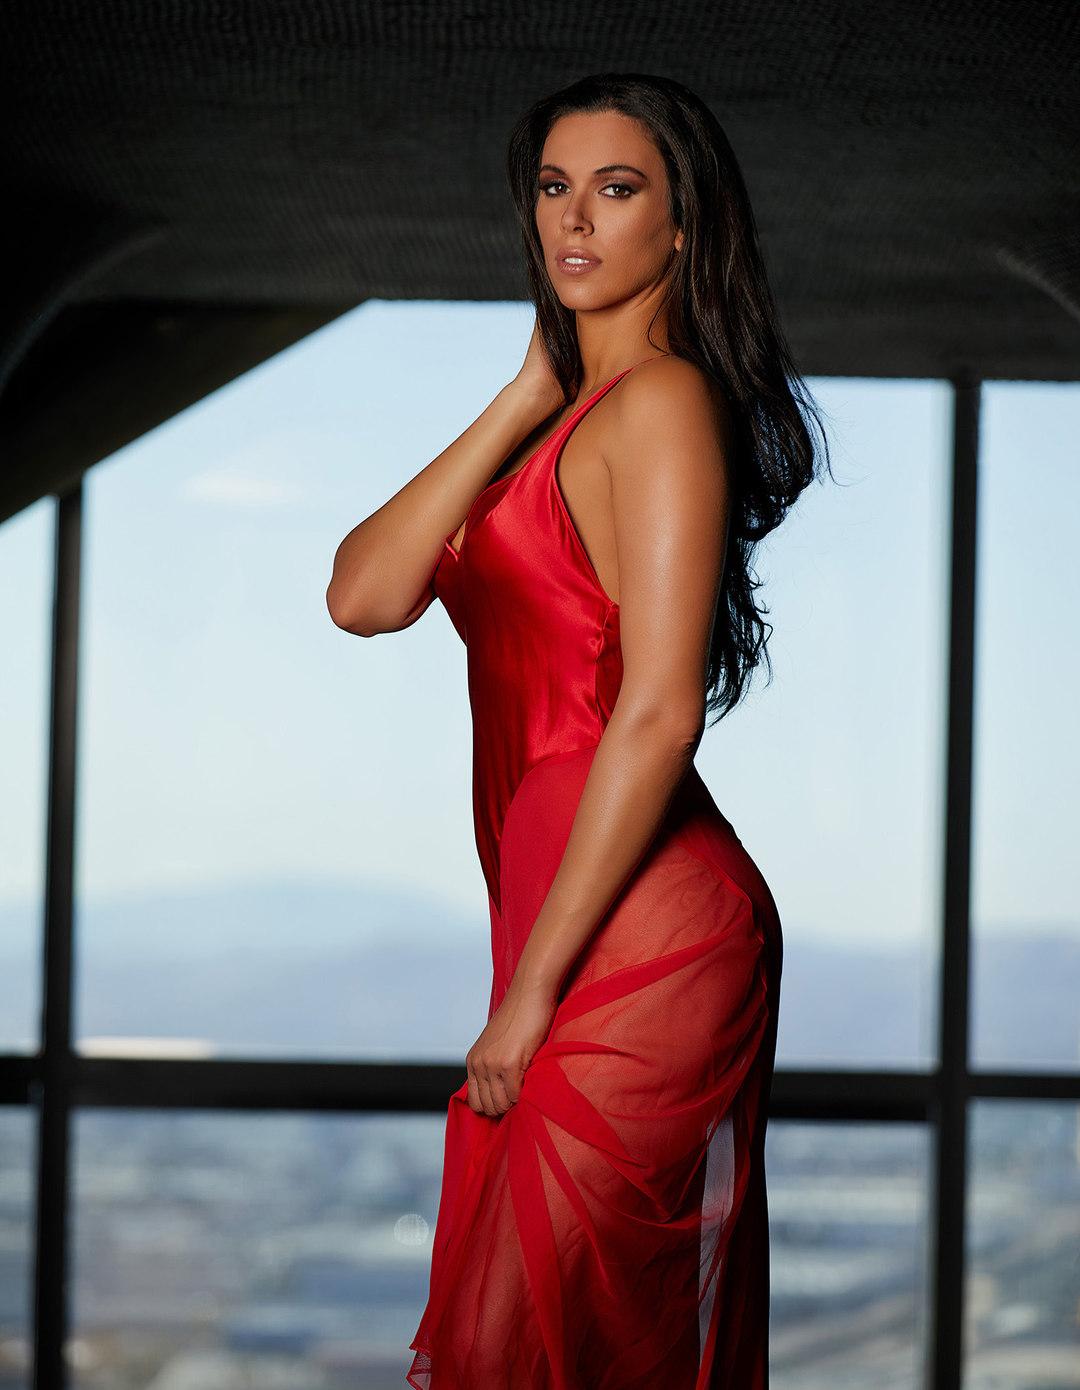 Pictures Tania Marie Caringi nude (22 photo), Pussy, Hot, Selfie, underwear 2020